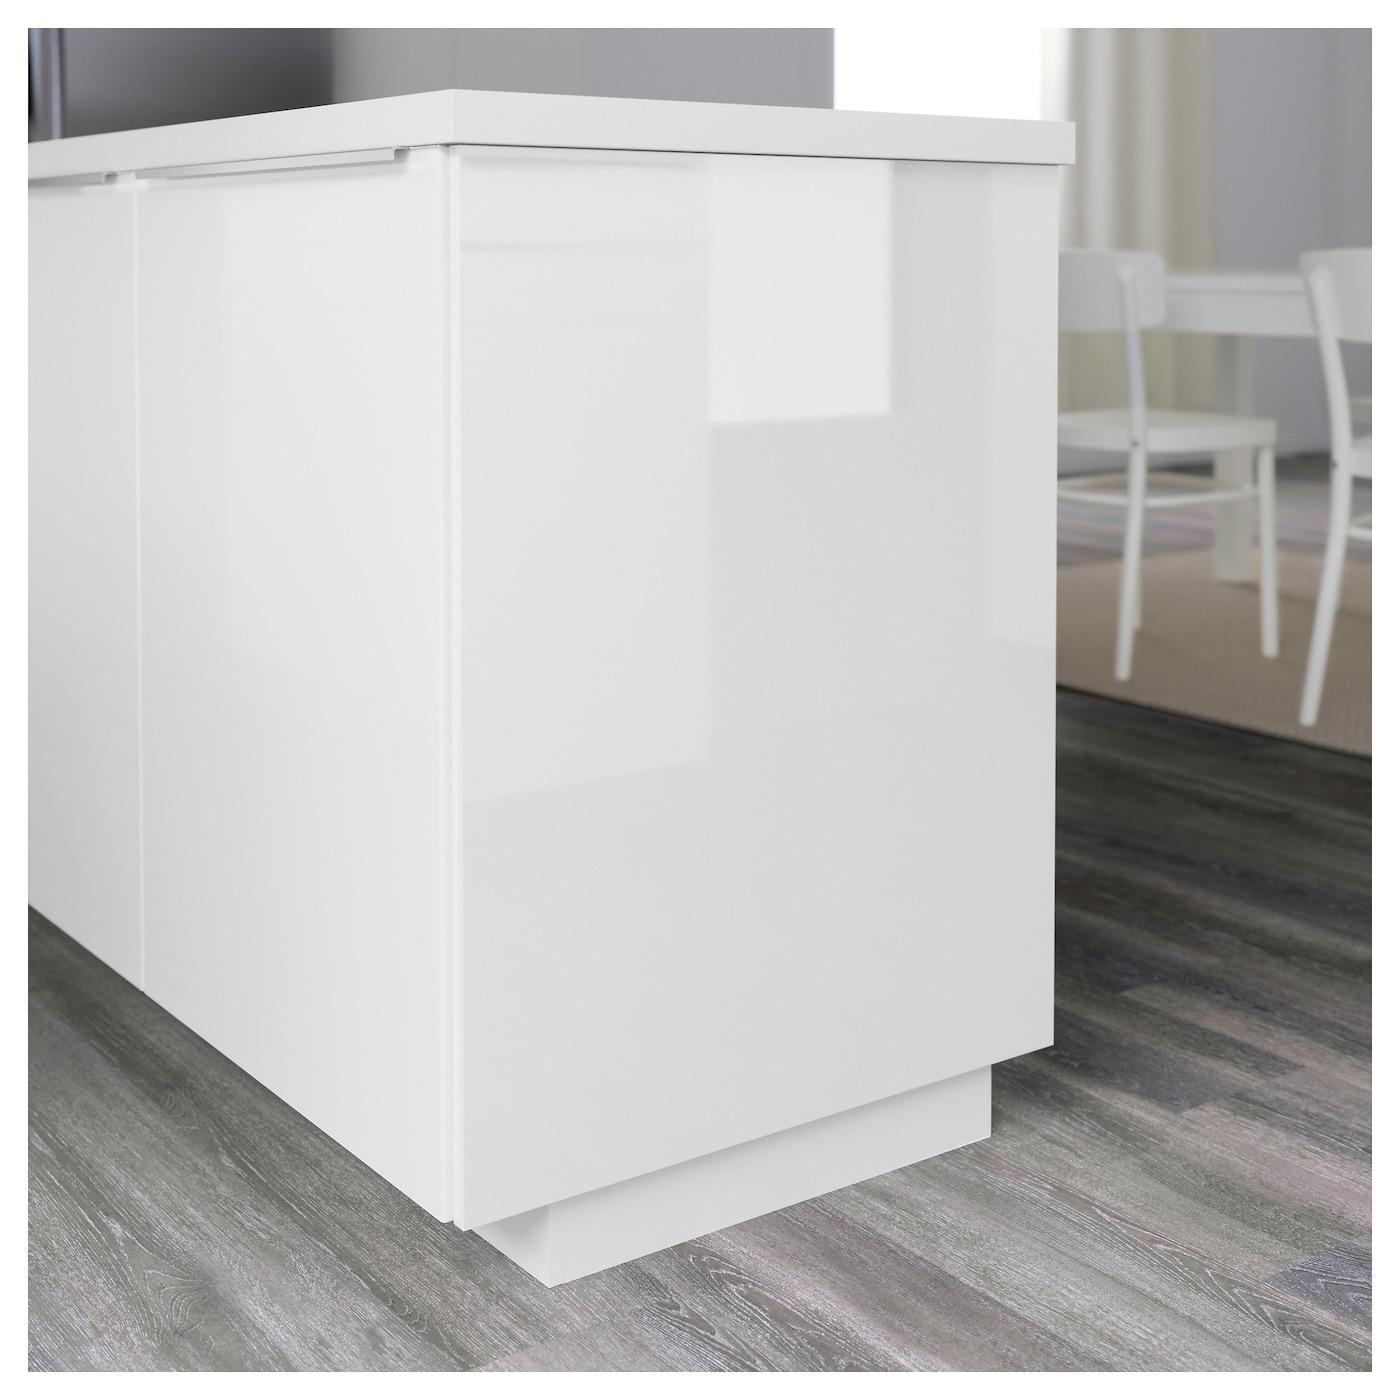 Ringhult Cover Panel High Gloss White 39x106 Cm Ikea